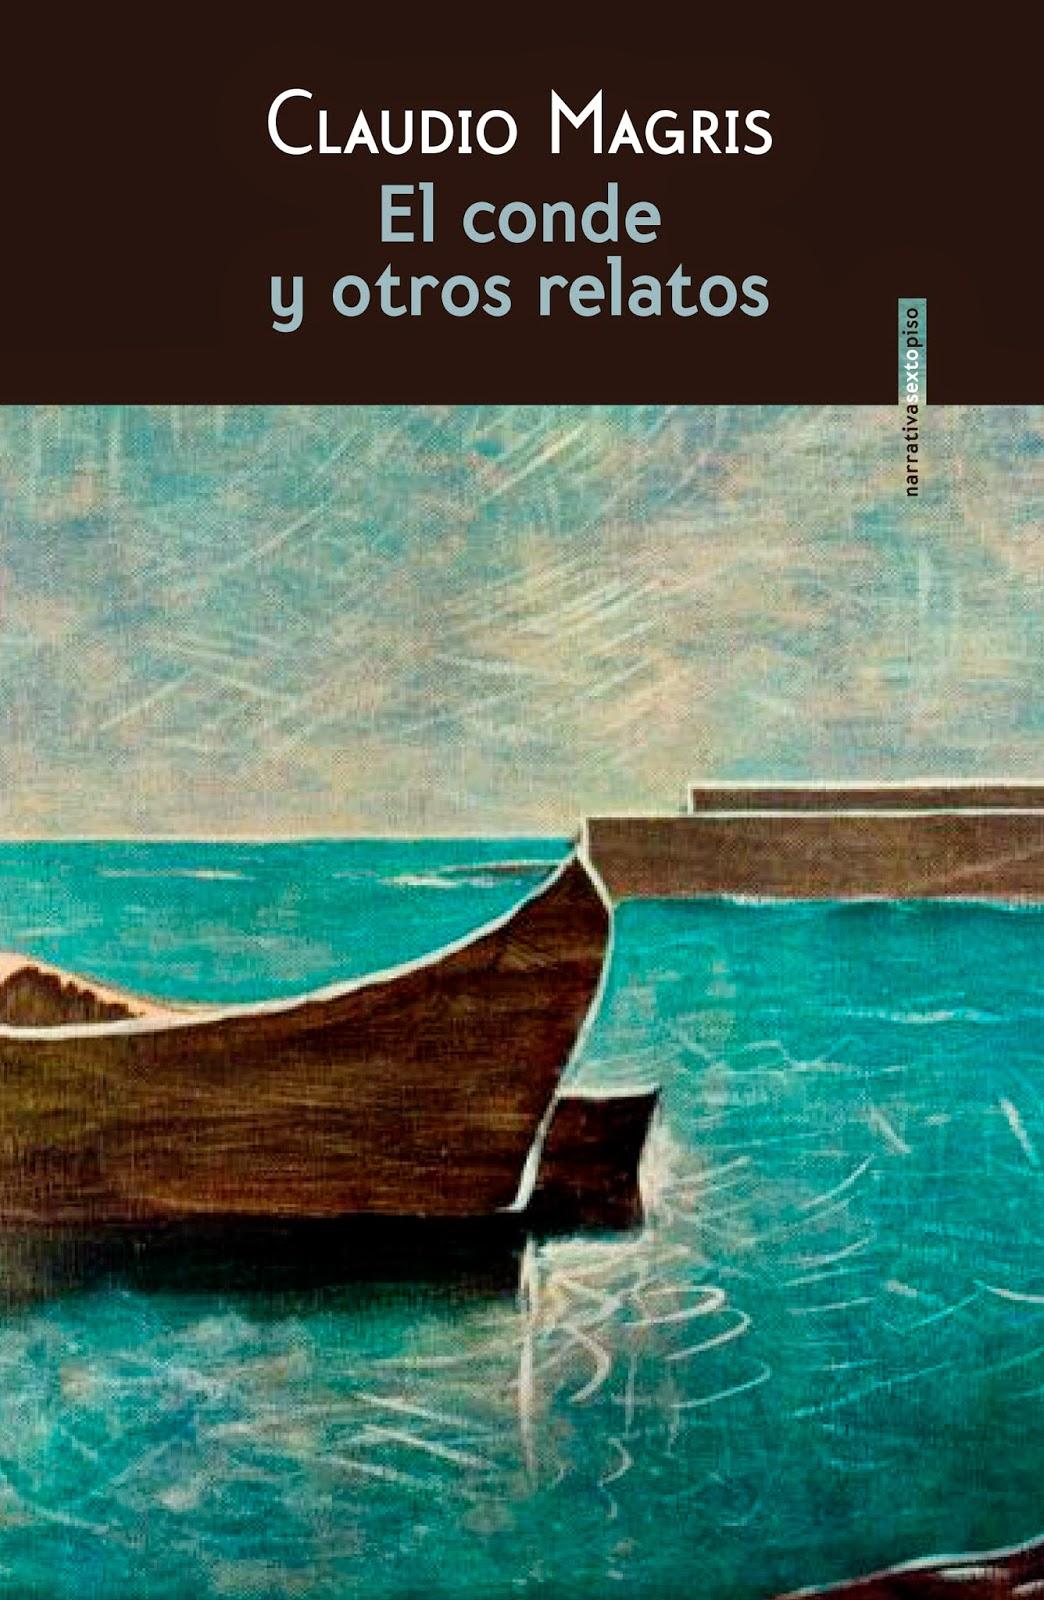 Claudio Magris: Premio FIL de Literatura en Lenguas Romances 2014